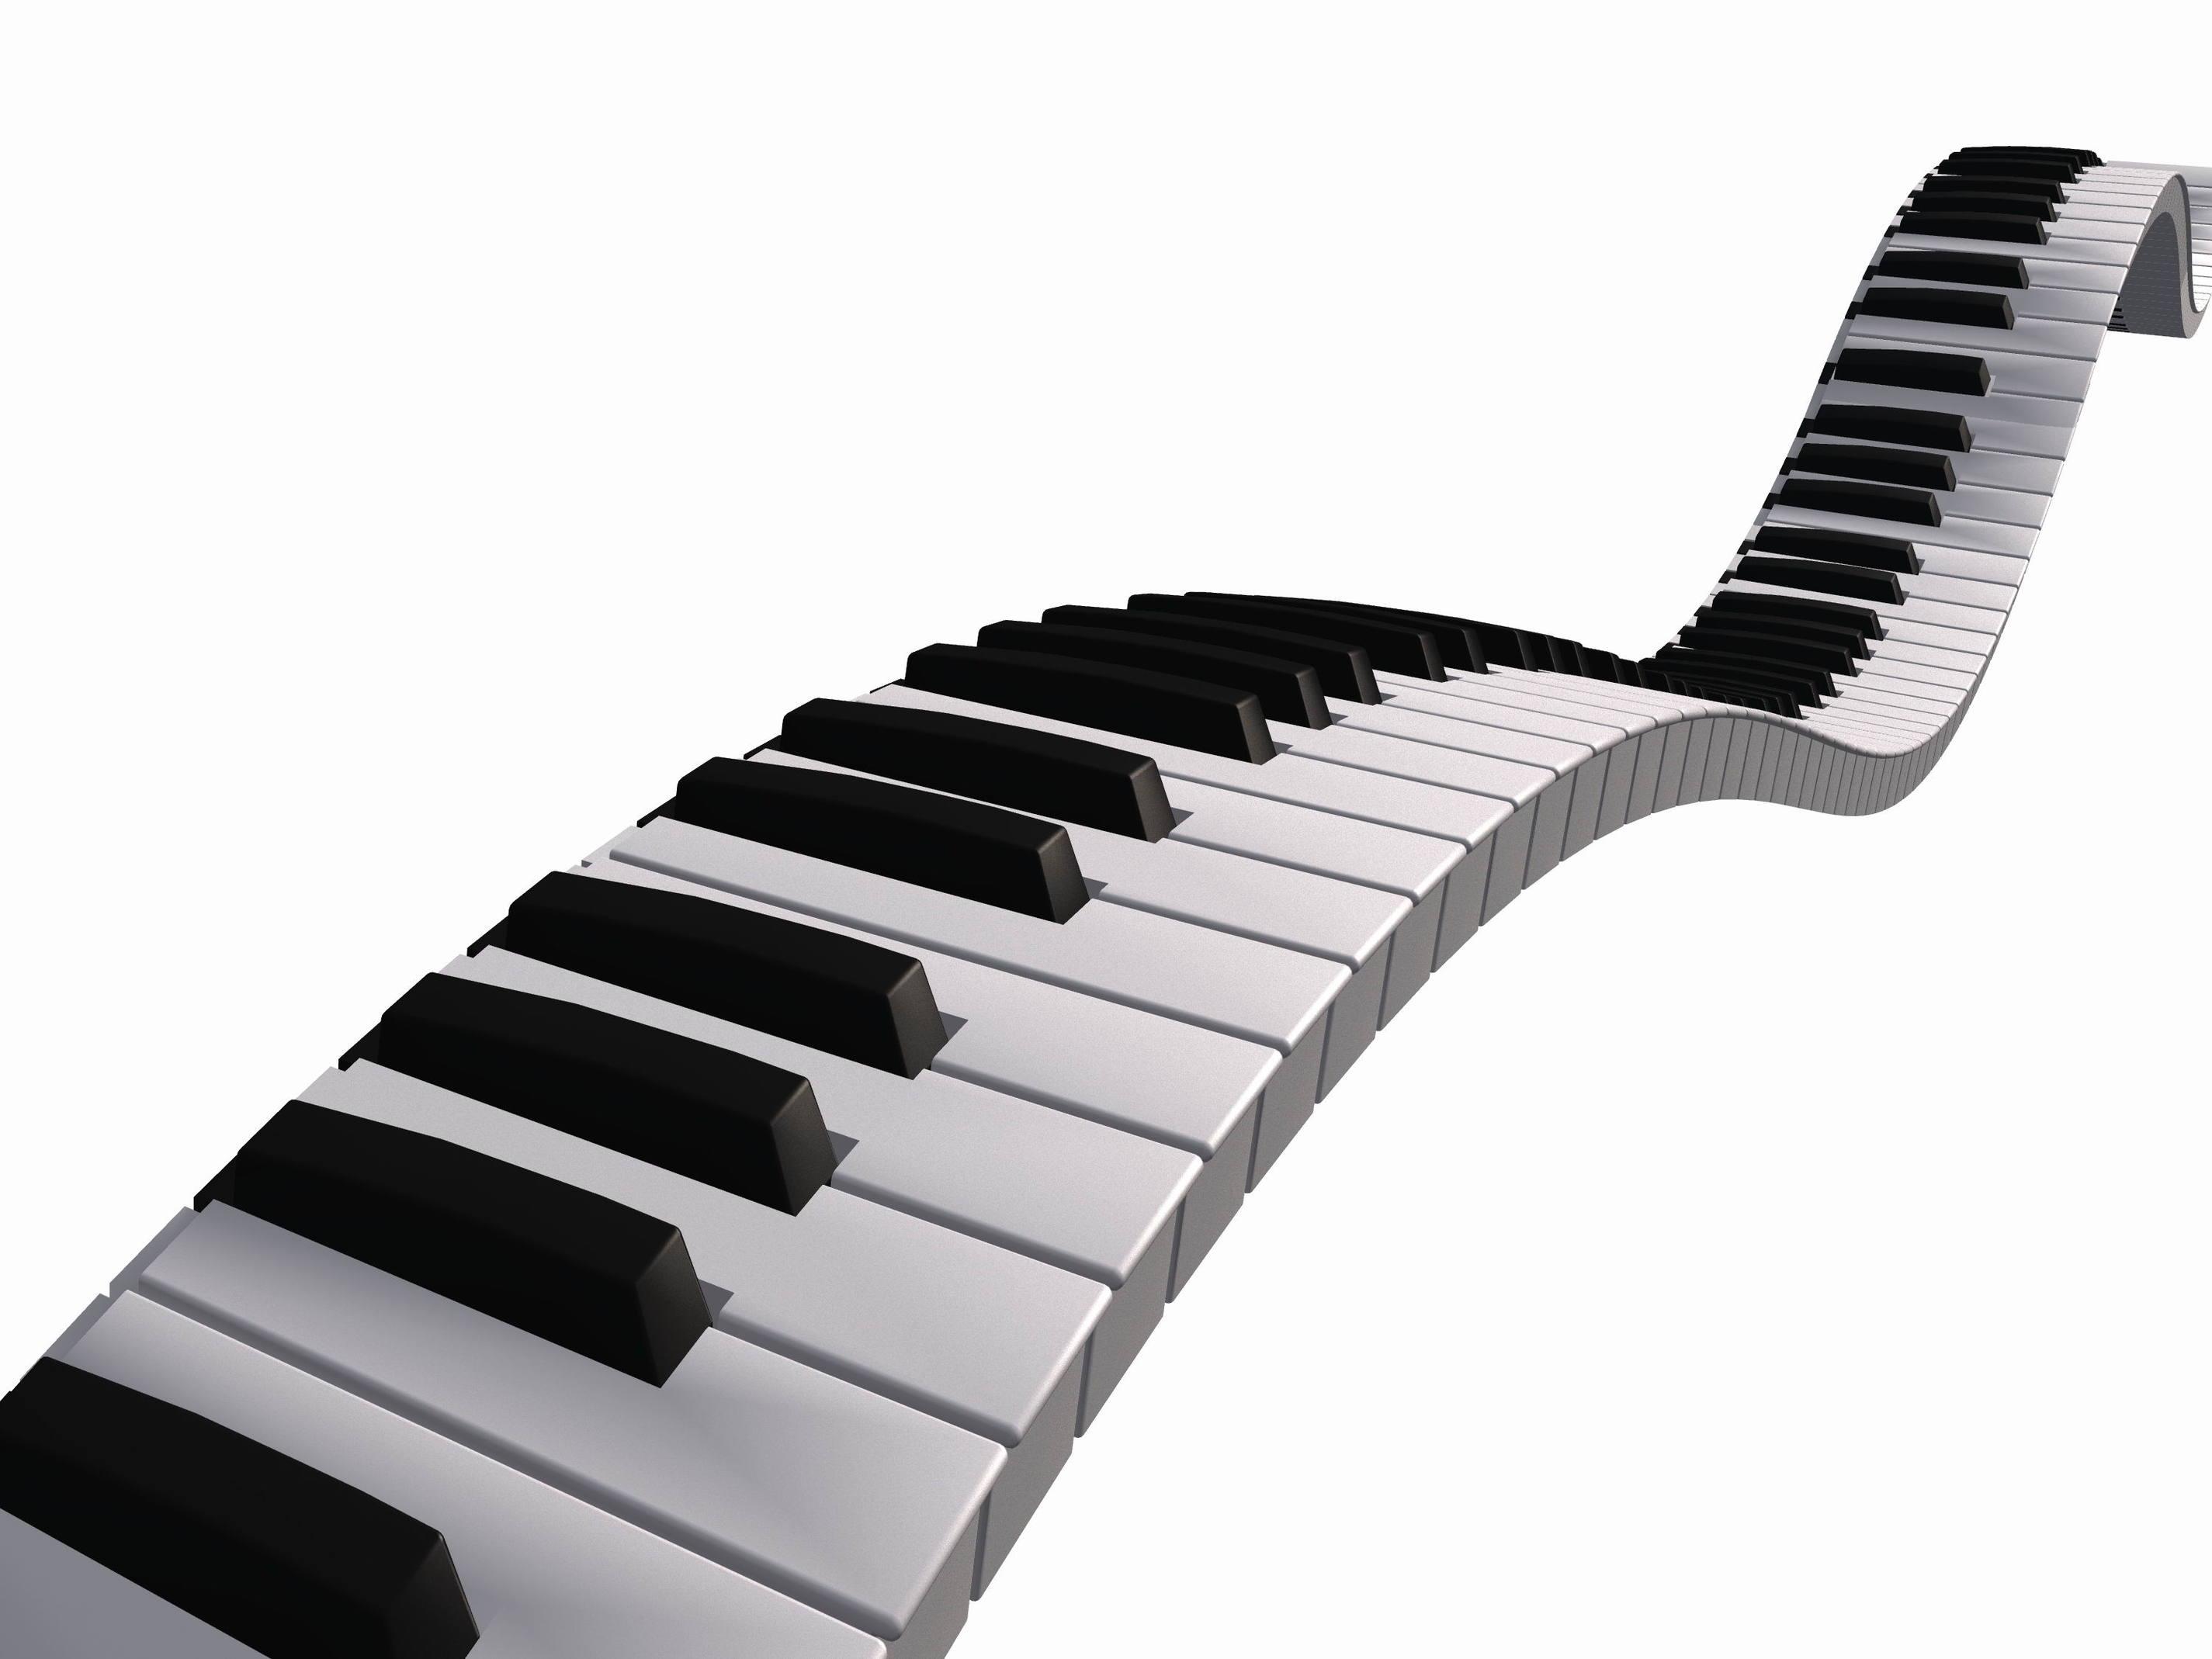 2850x2138 Piano Keys Clip Art